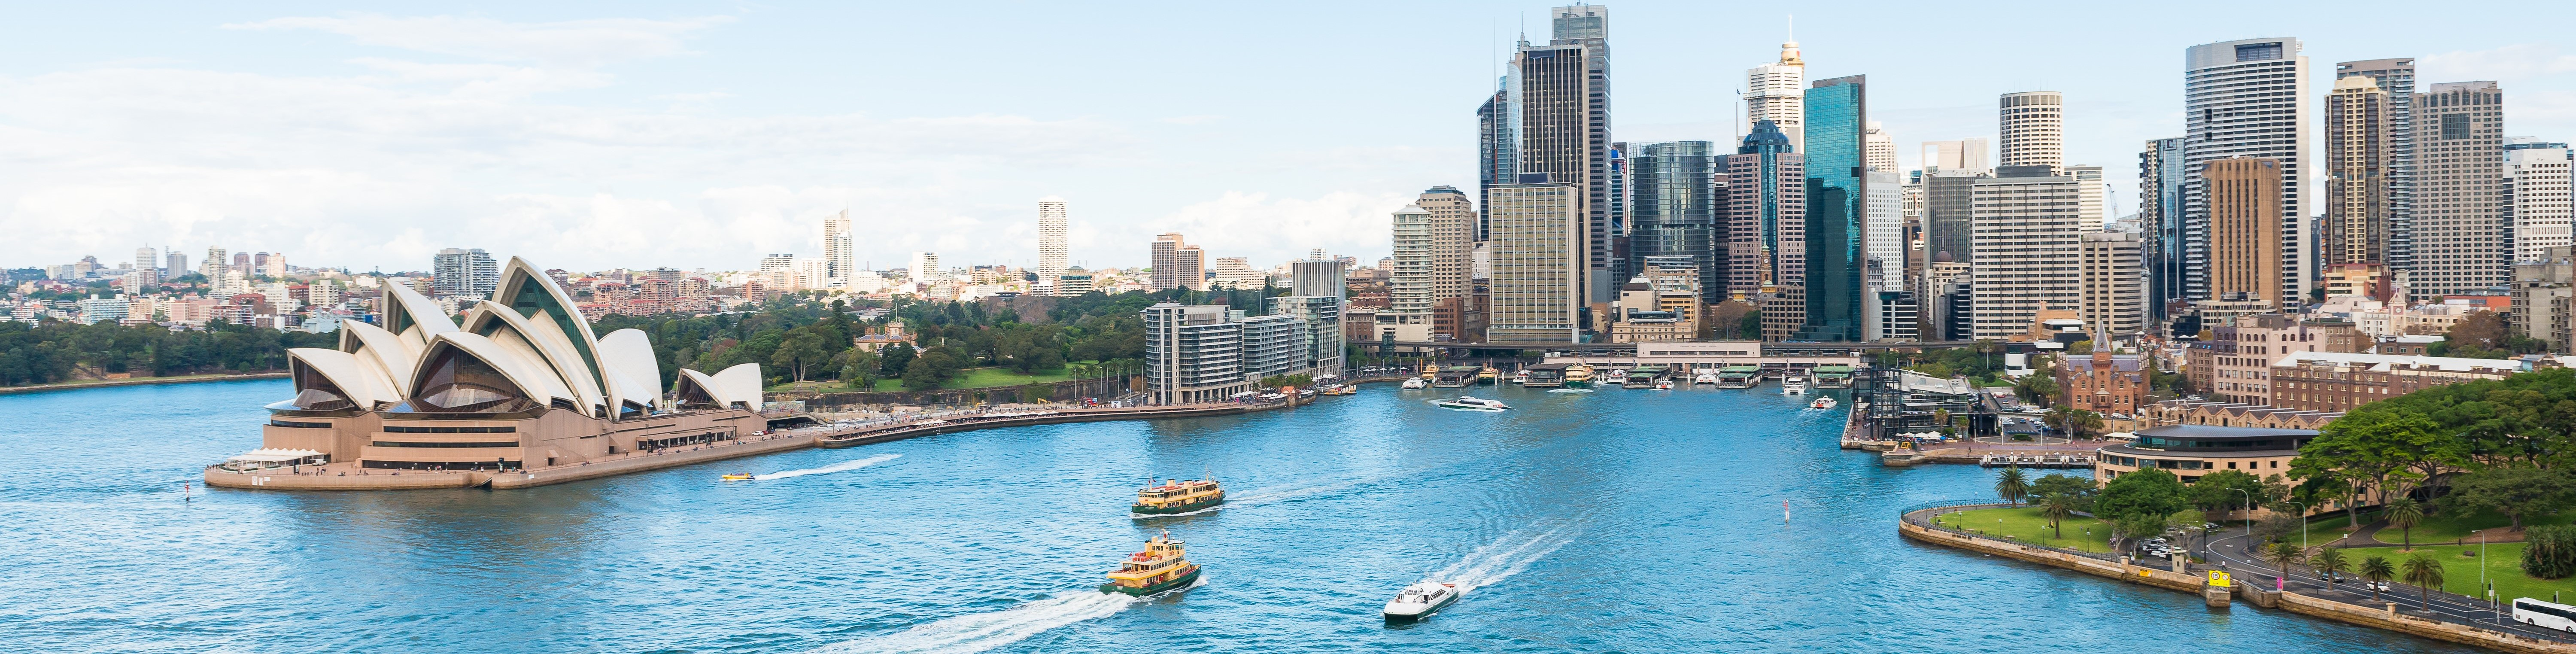 Australia Sydney aerial.jpg CROPPED-1.jpg